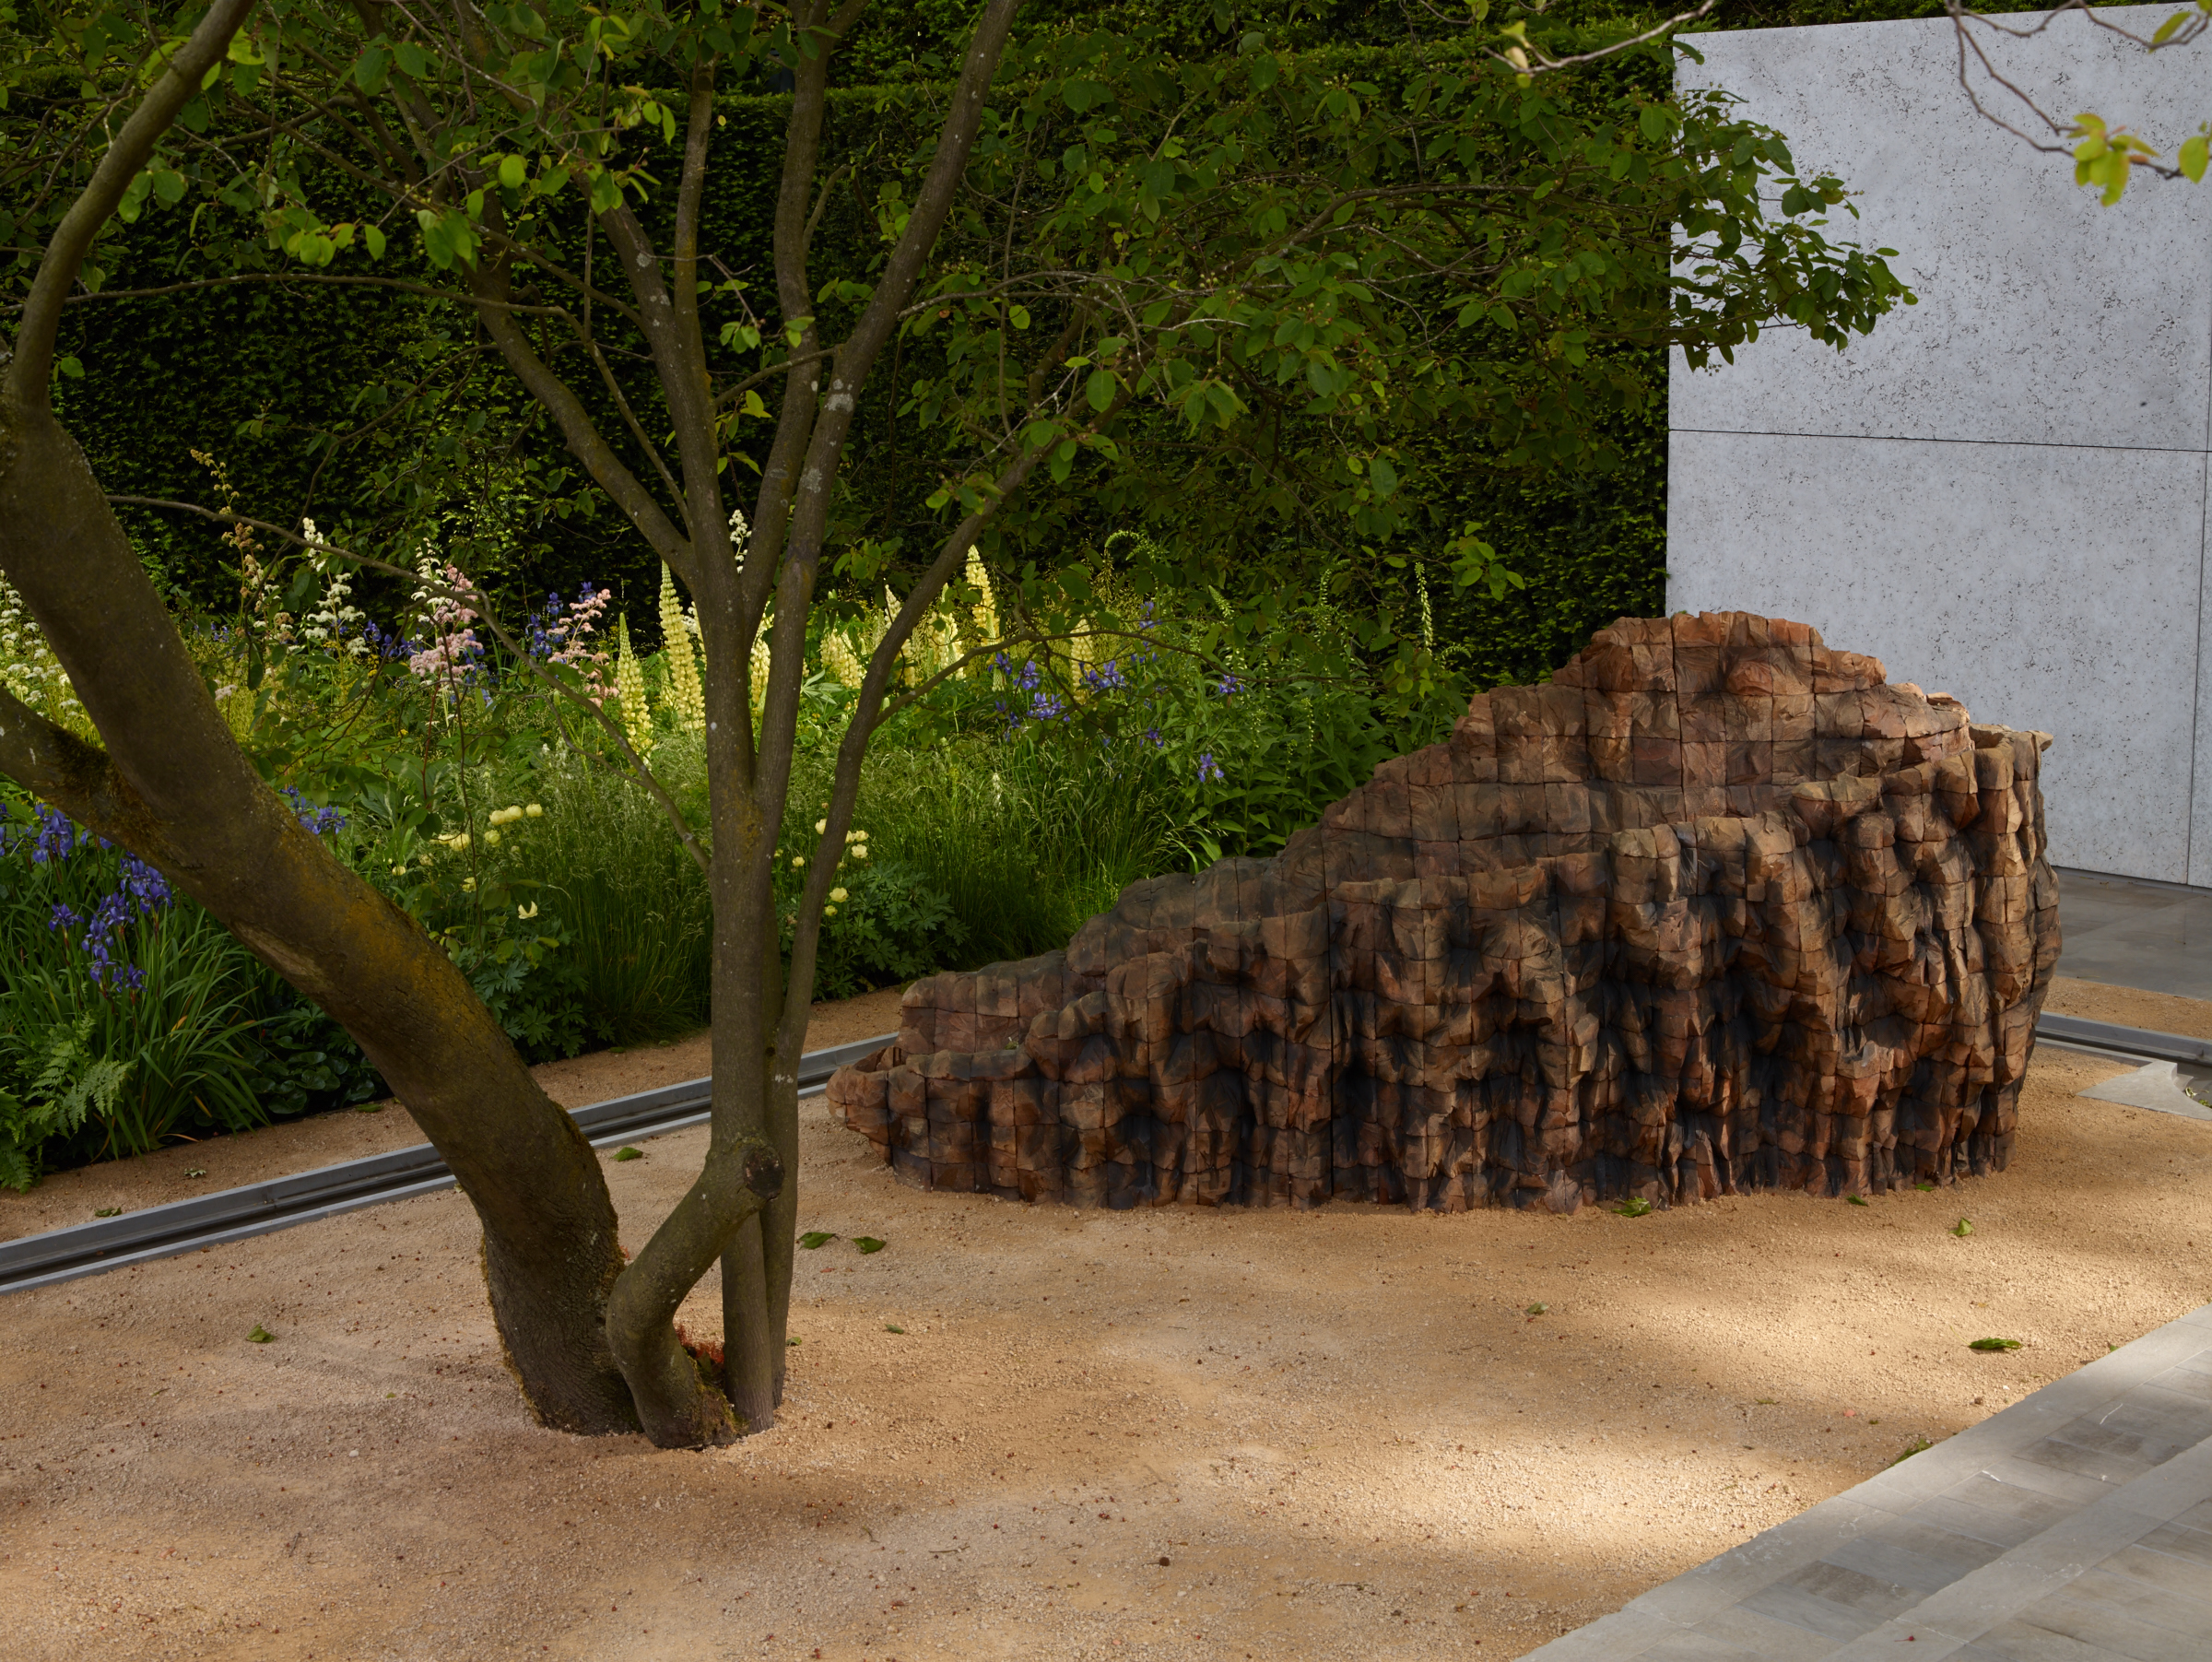 Luciano Giubbilei Laurent Perrier Garden 2014. Sculpture by Ursula von Rydingsvard. Photo courtesy of studio Allan Pollok-Morris.